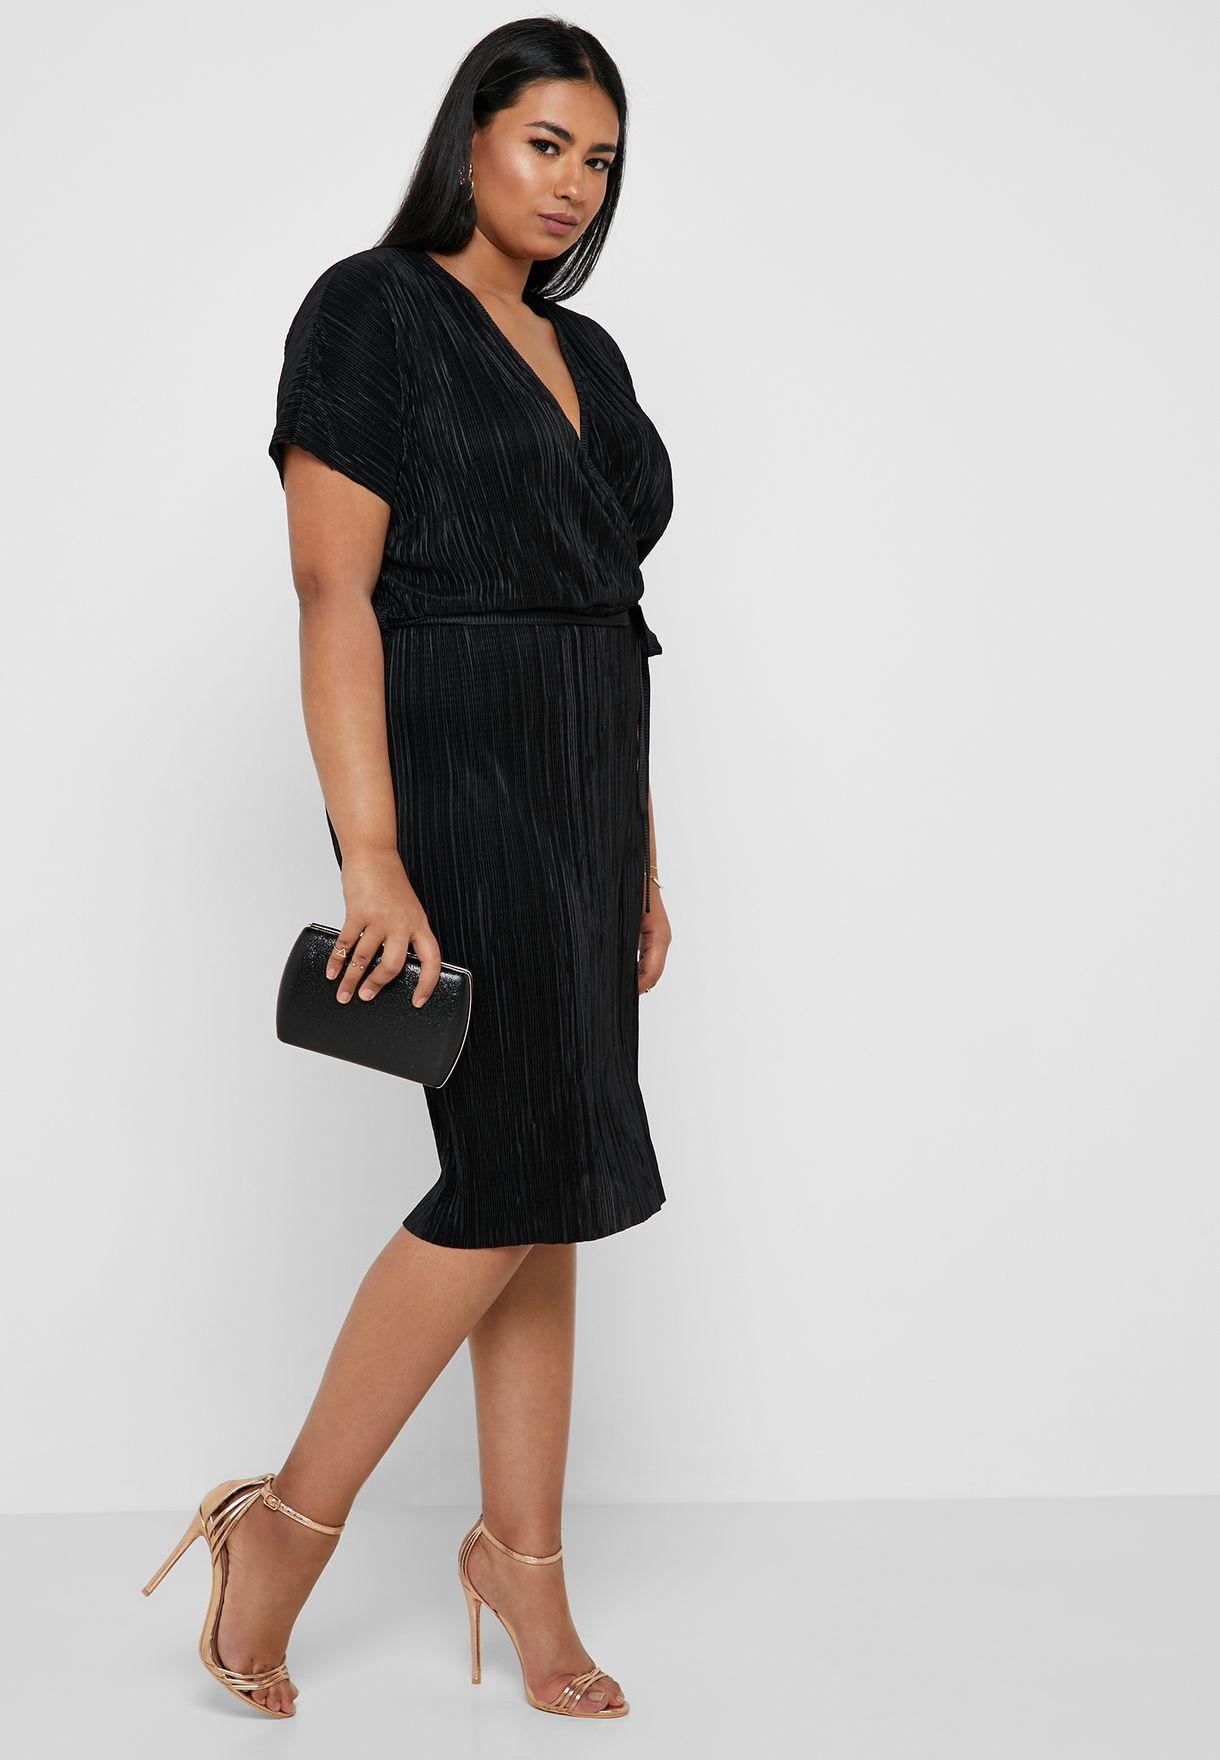 69ddbc7485a Shop Dorothy Perkins Curve black Plisse Wrap Dress 3212613 for ...